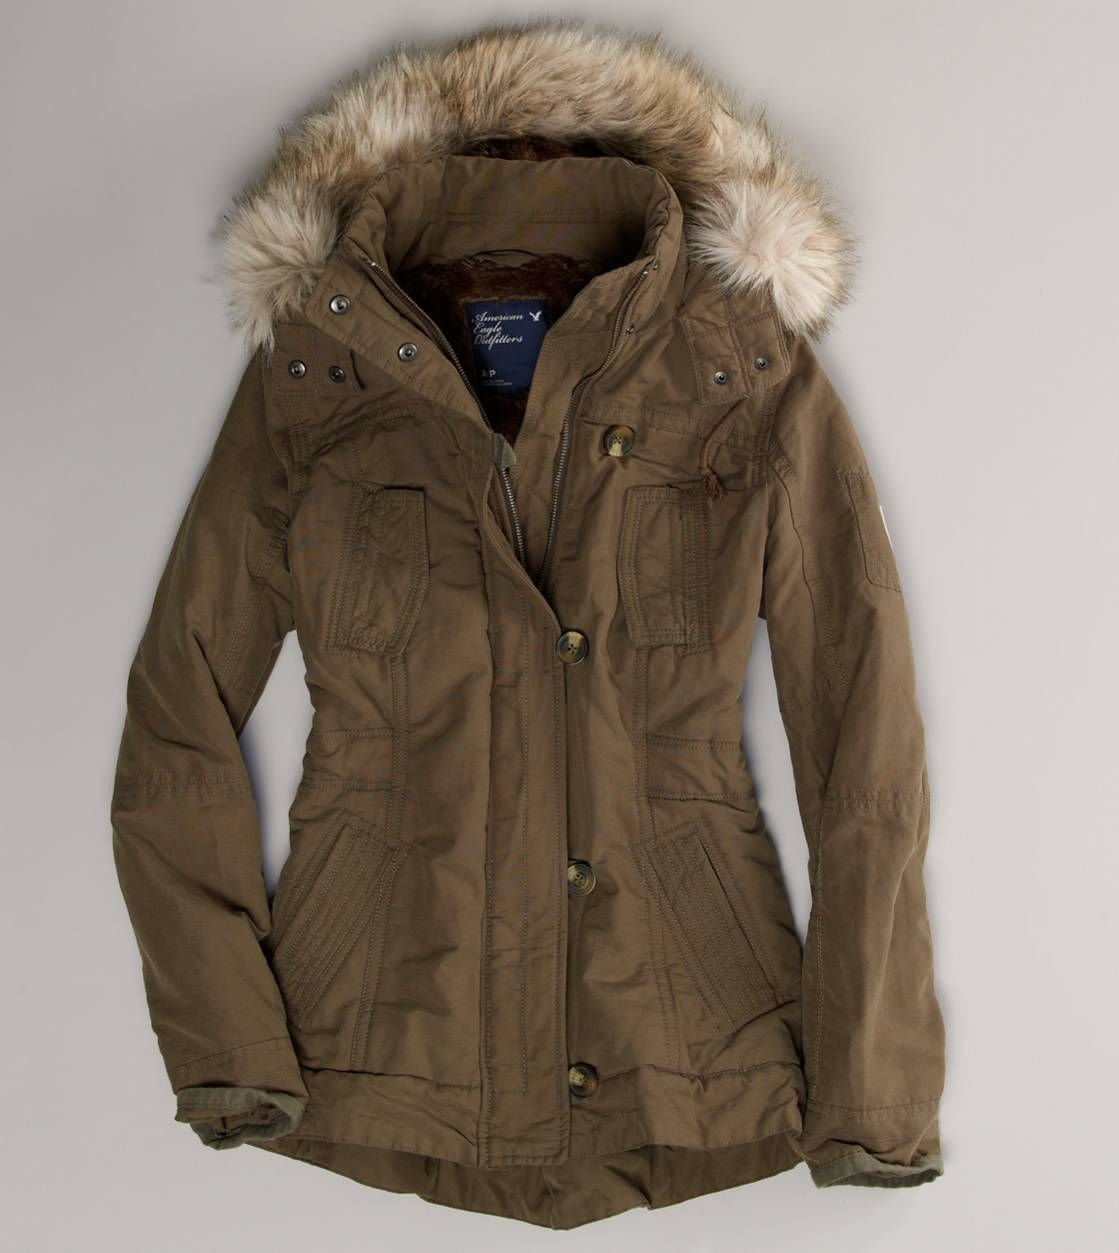 ae military hooded parka | Style | Pinterest | Long winter coats ...